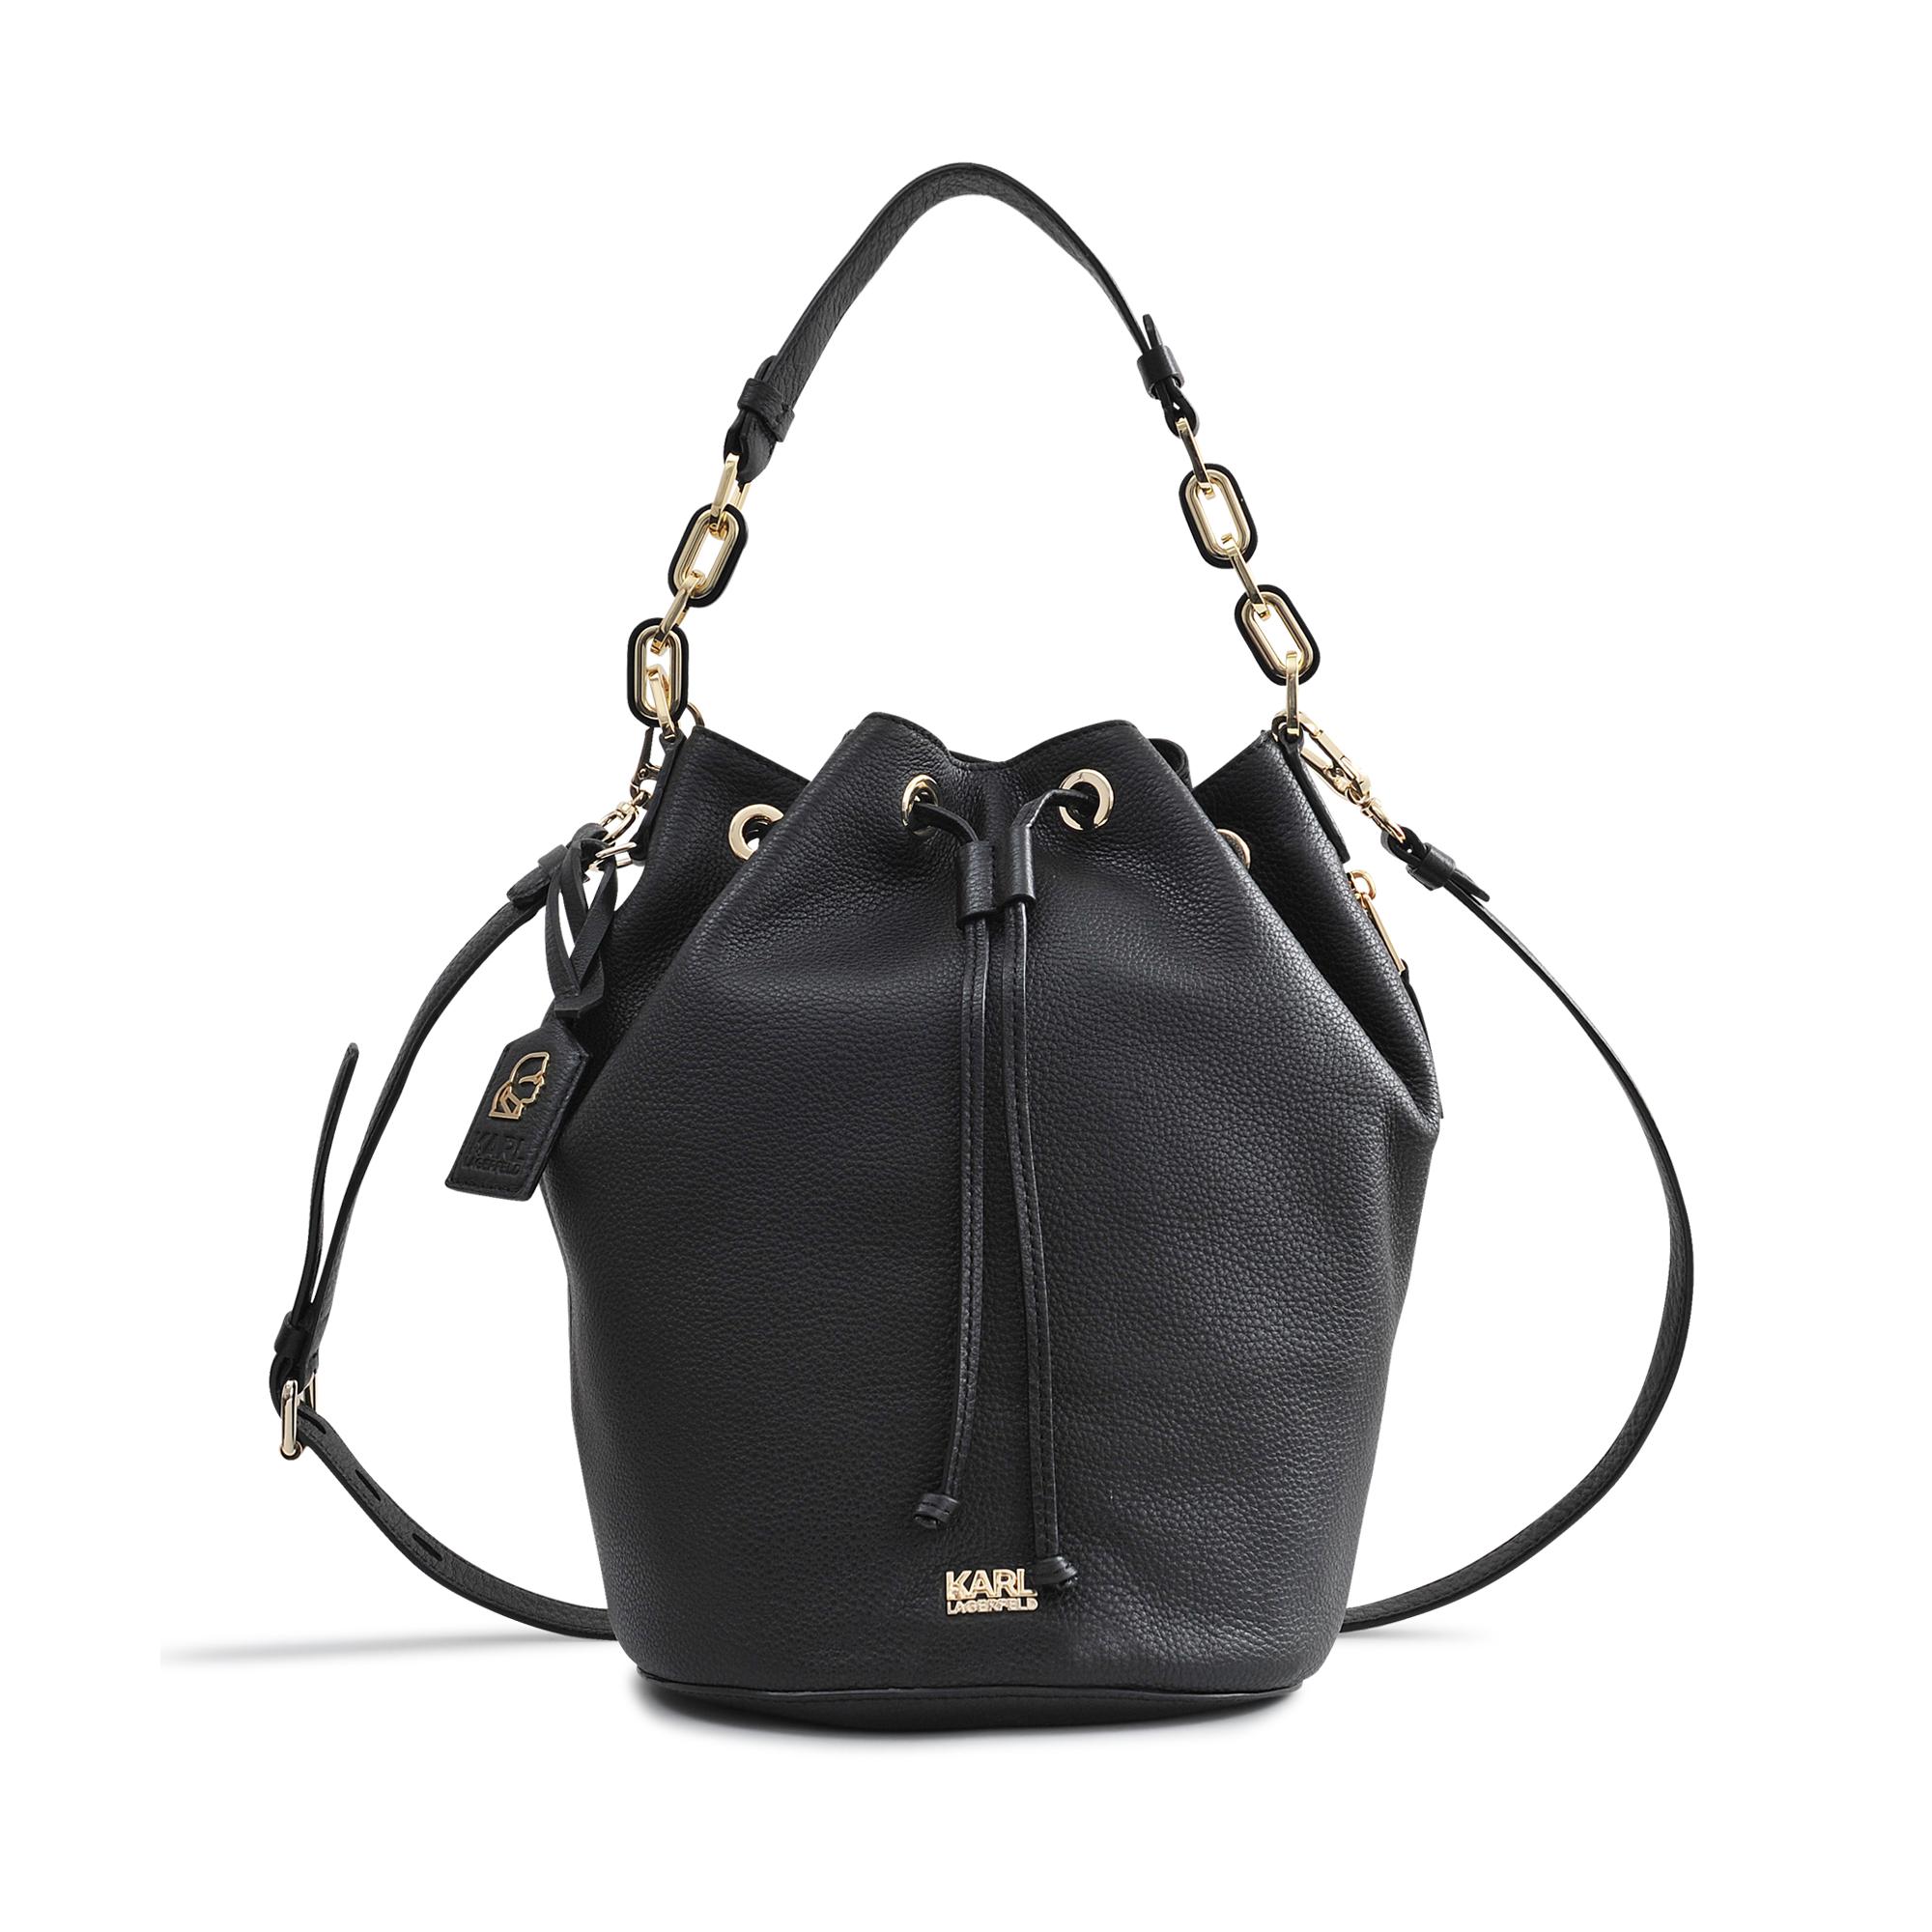 3d497e1451 Karl Lagerfeld Grainy Drawstring Bucket Bag in Black - Lyst